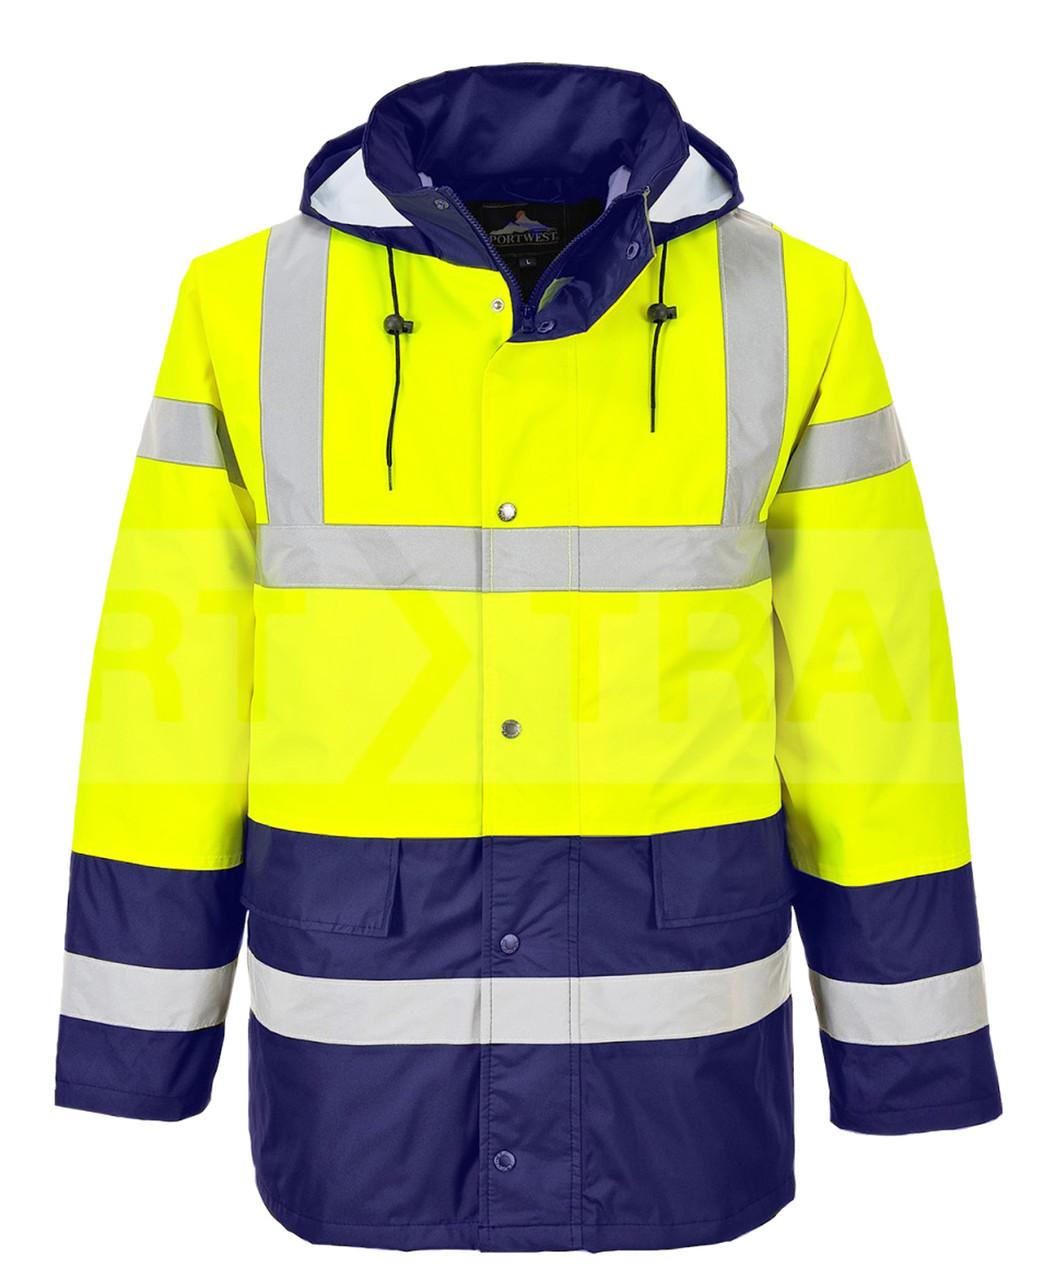 Hi-Vis Traffic Jacket - Hi-Vis Yellow/Navy Blue Bottom ## US466YNB ##